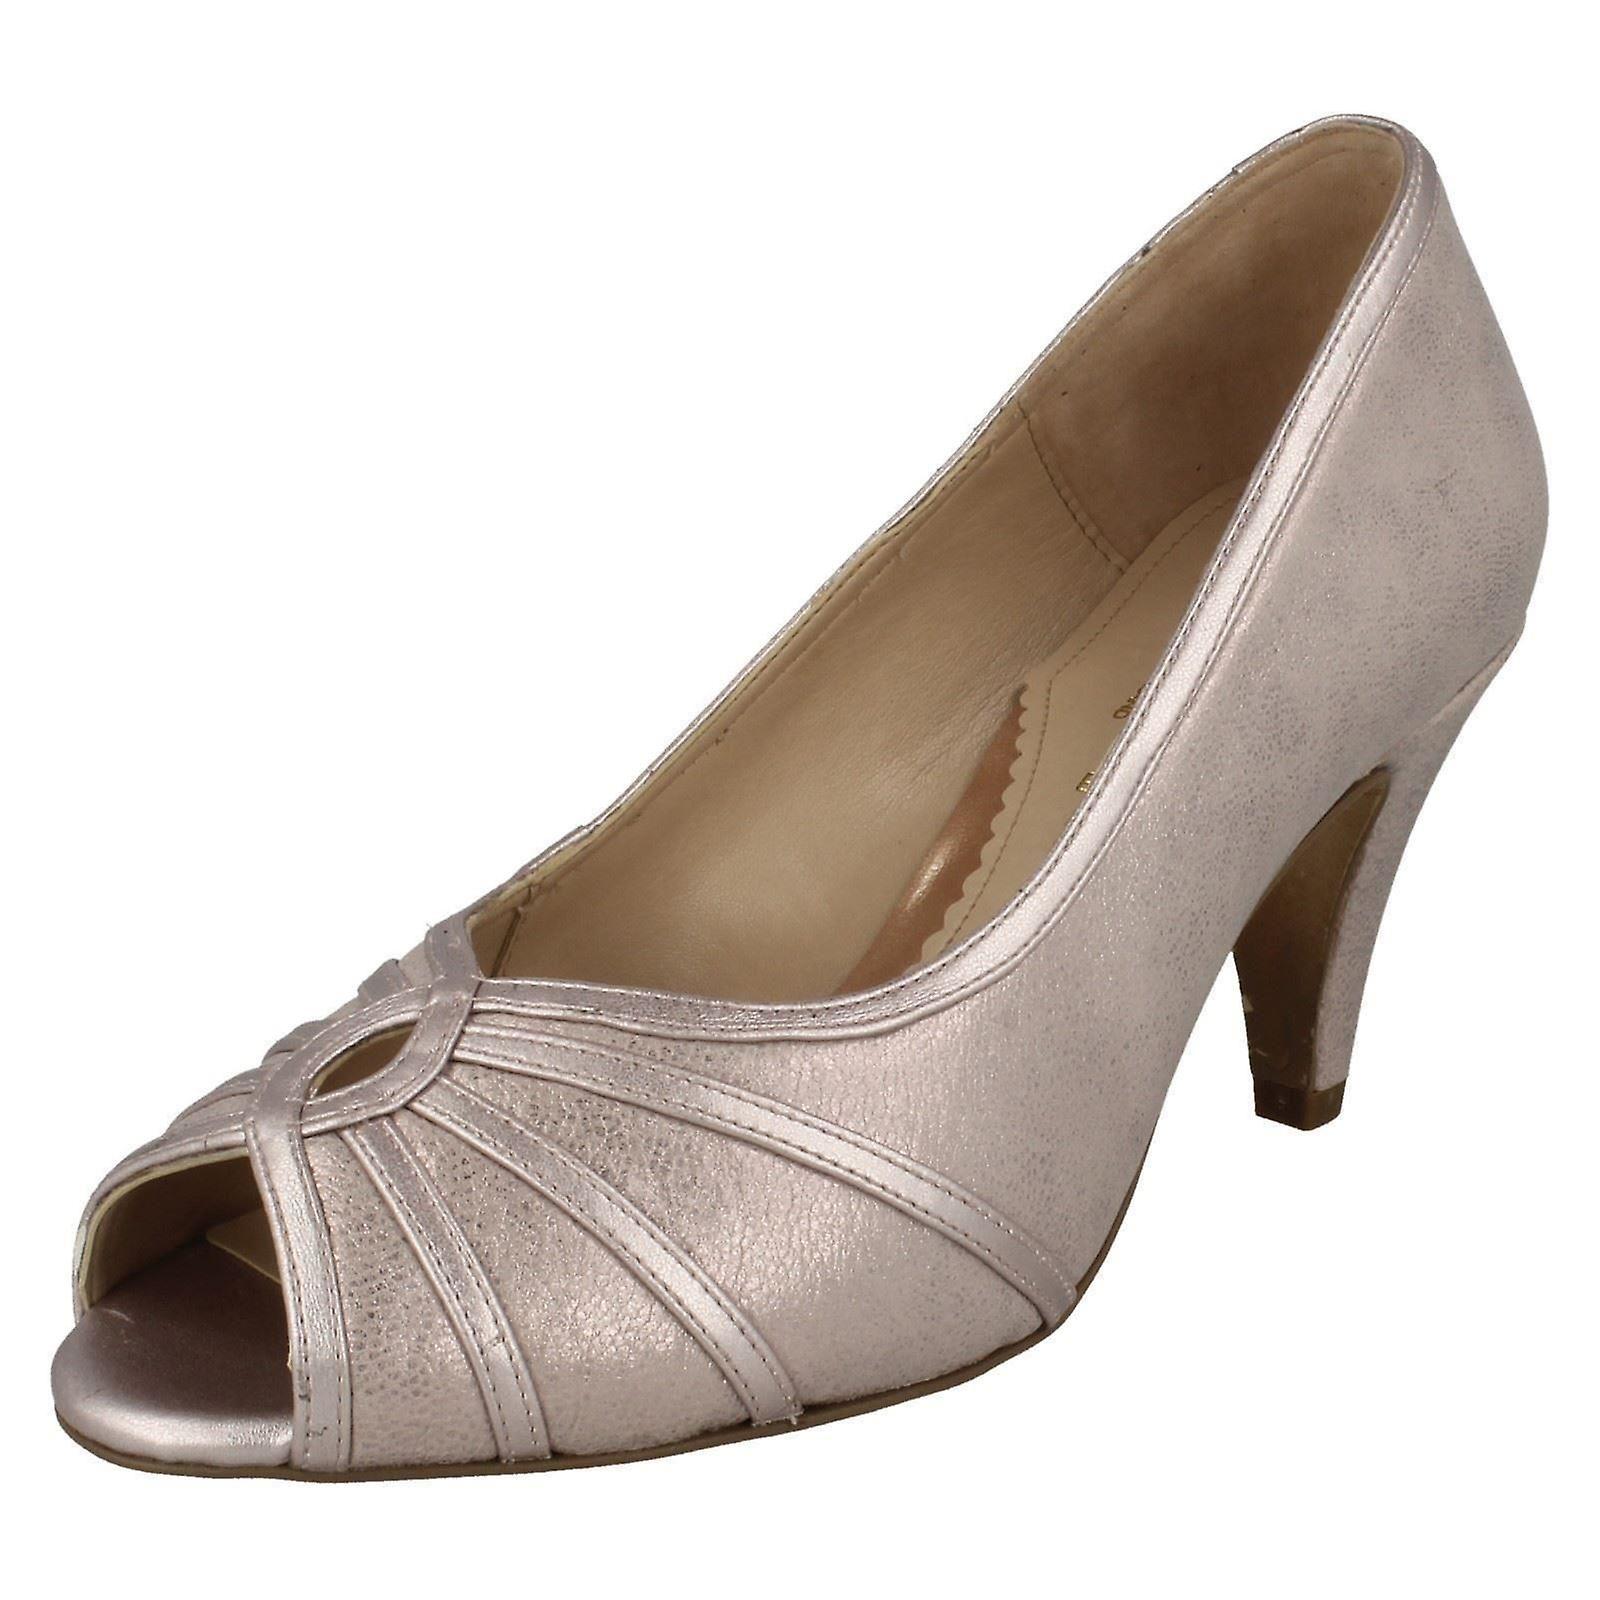 Ladies Elegant Van Dal Peep Toe Shoes Hart - Bamboo Metallic Leather - UK Size 8EE - EU Size 42 - US Size 10